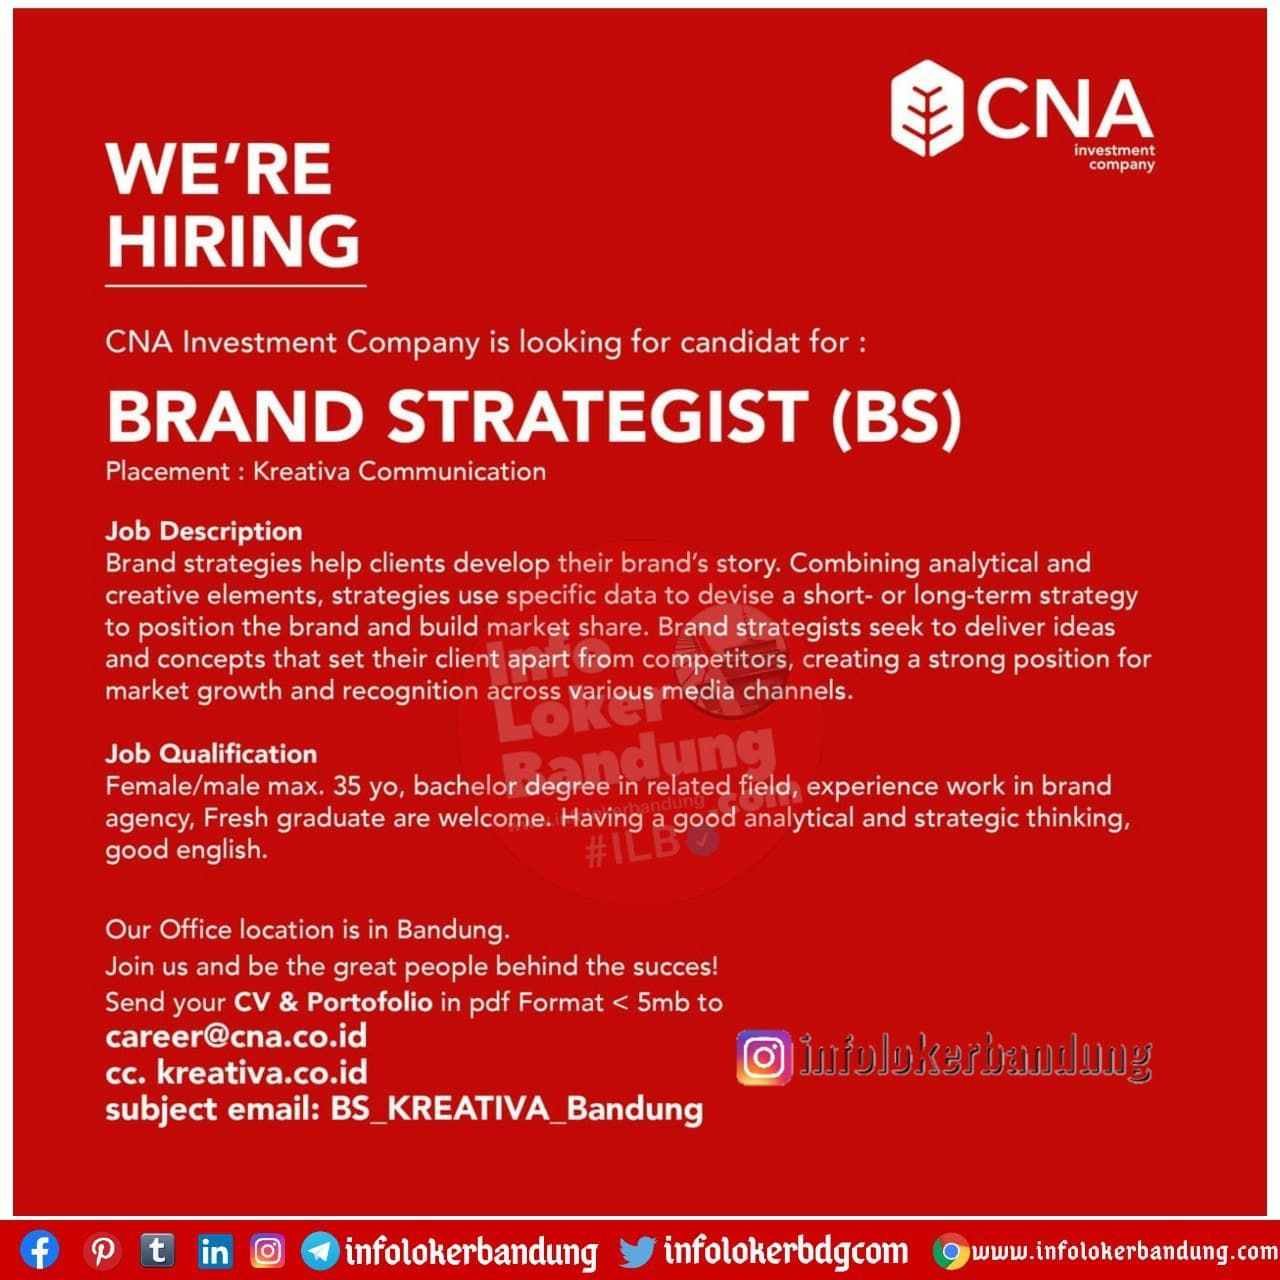 Lowongan Kerja CNA Investment Company Bandung Desember 2020